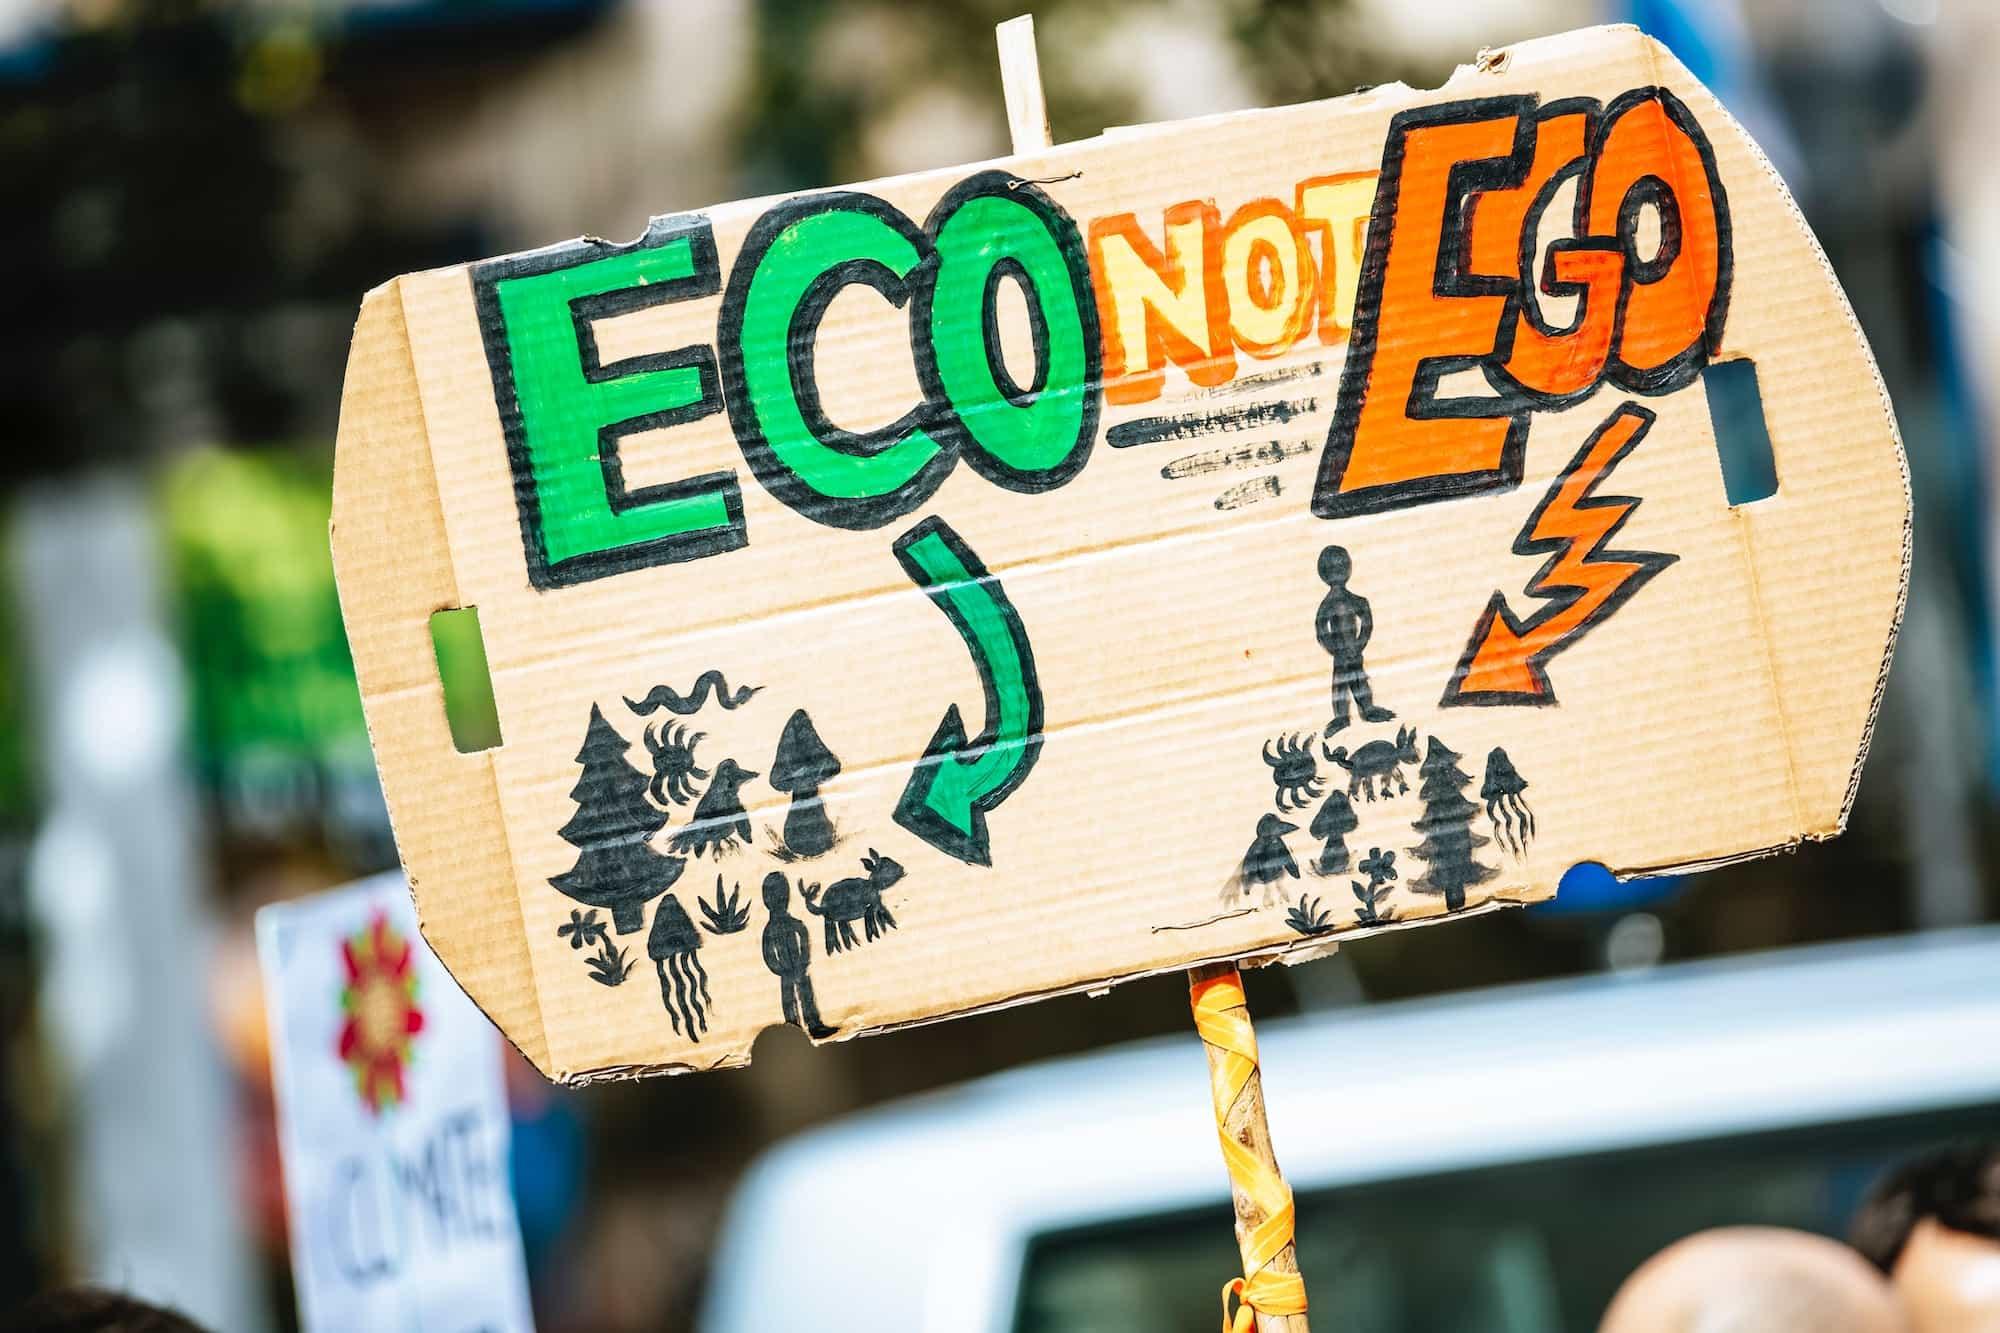 Flightnook-Eco vs Ego